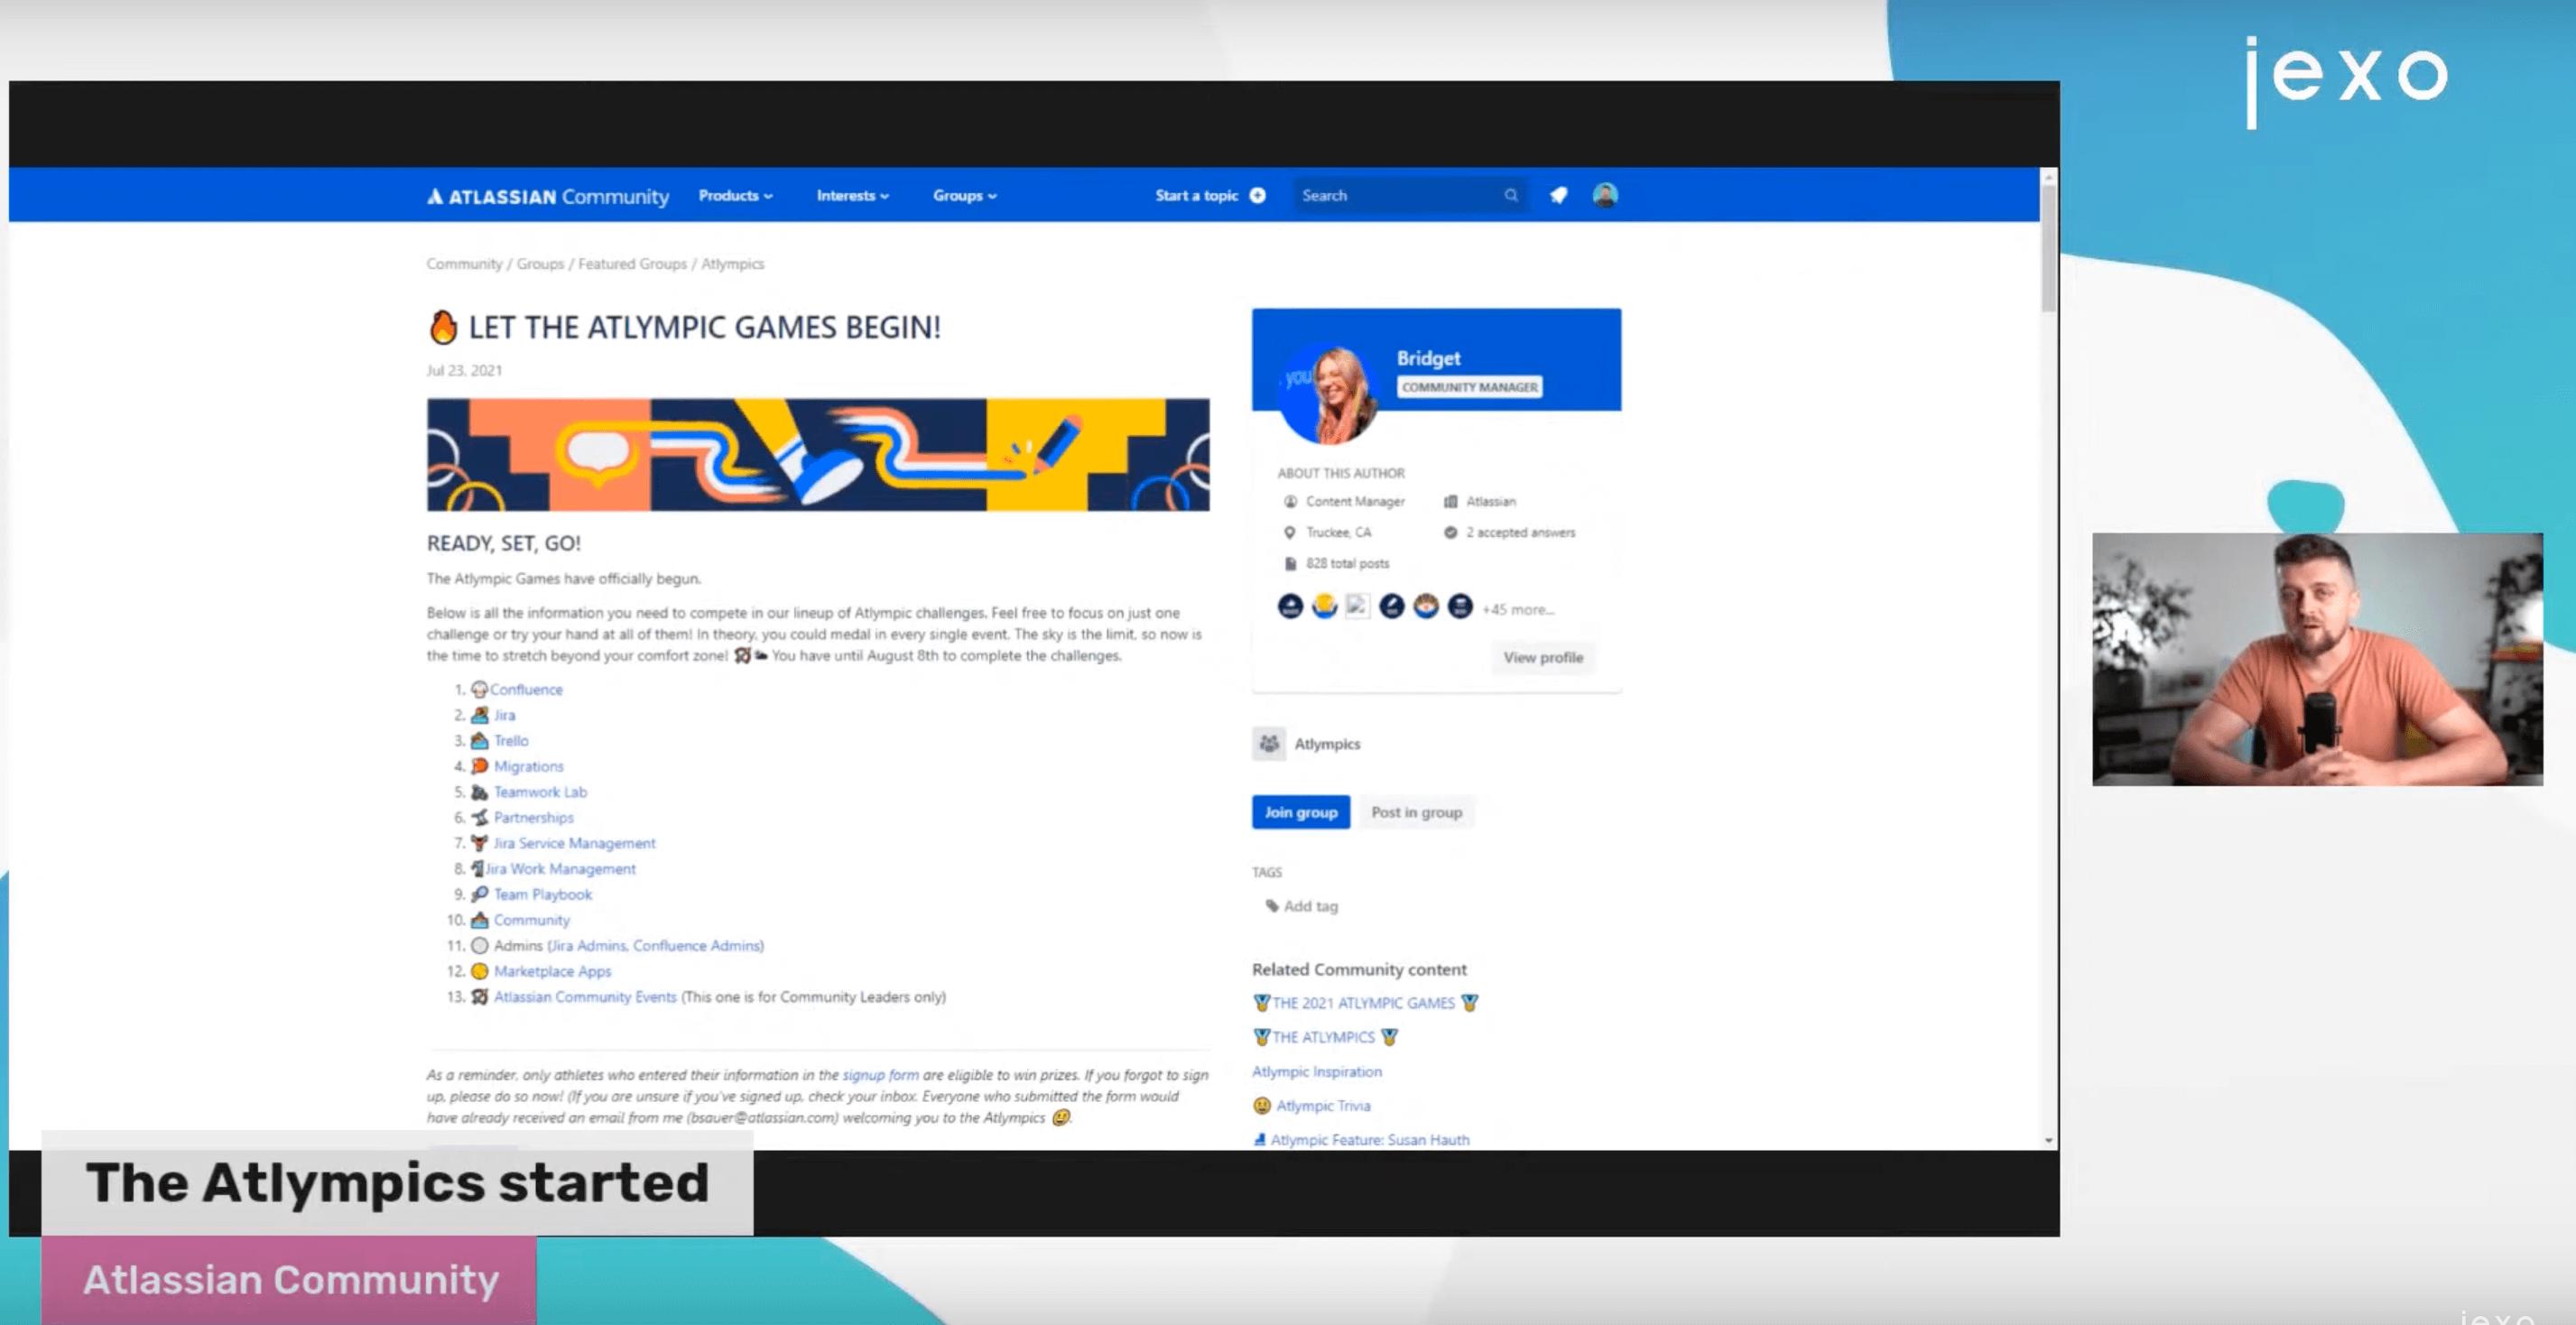 Atlassian News: The Atlympics user community games are on!